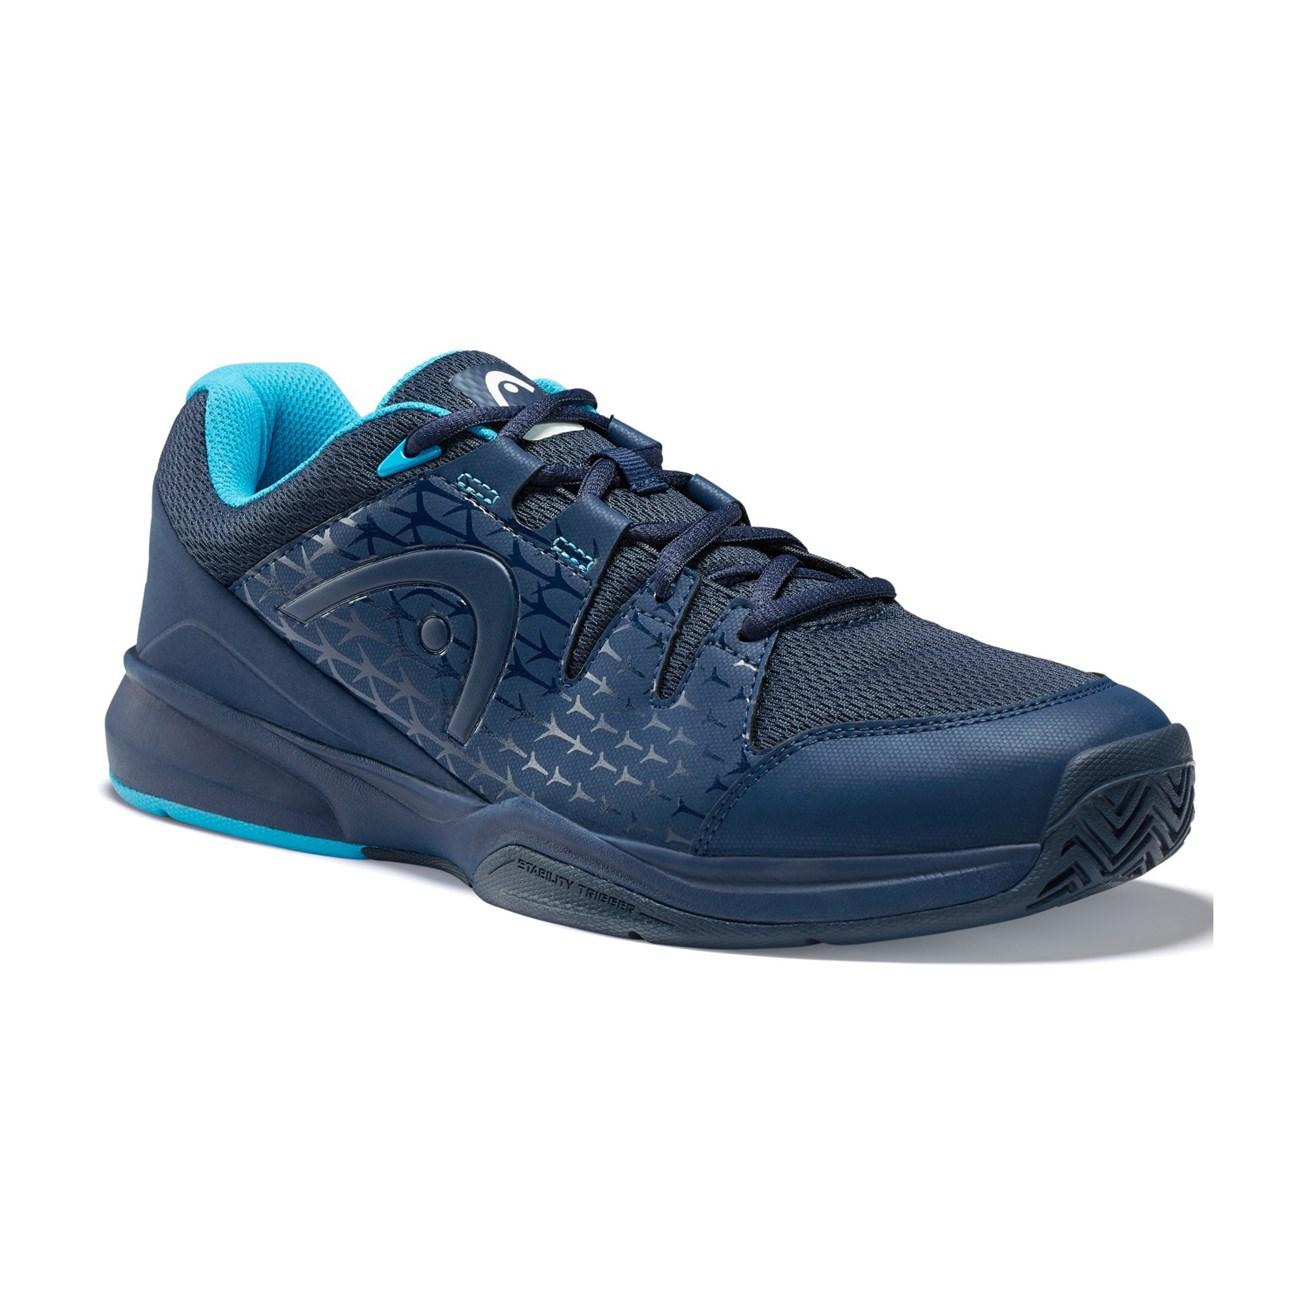 4b37950ec32 HEAD Brazer M < Παπούτσια Τένις | INTERSPORT